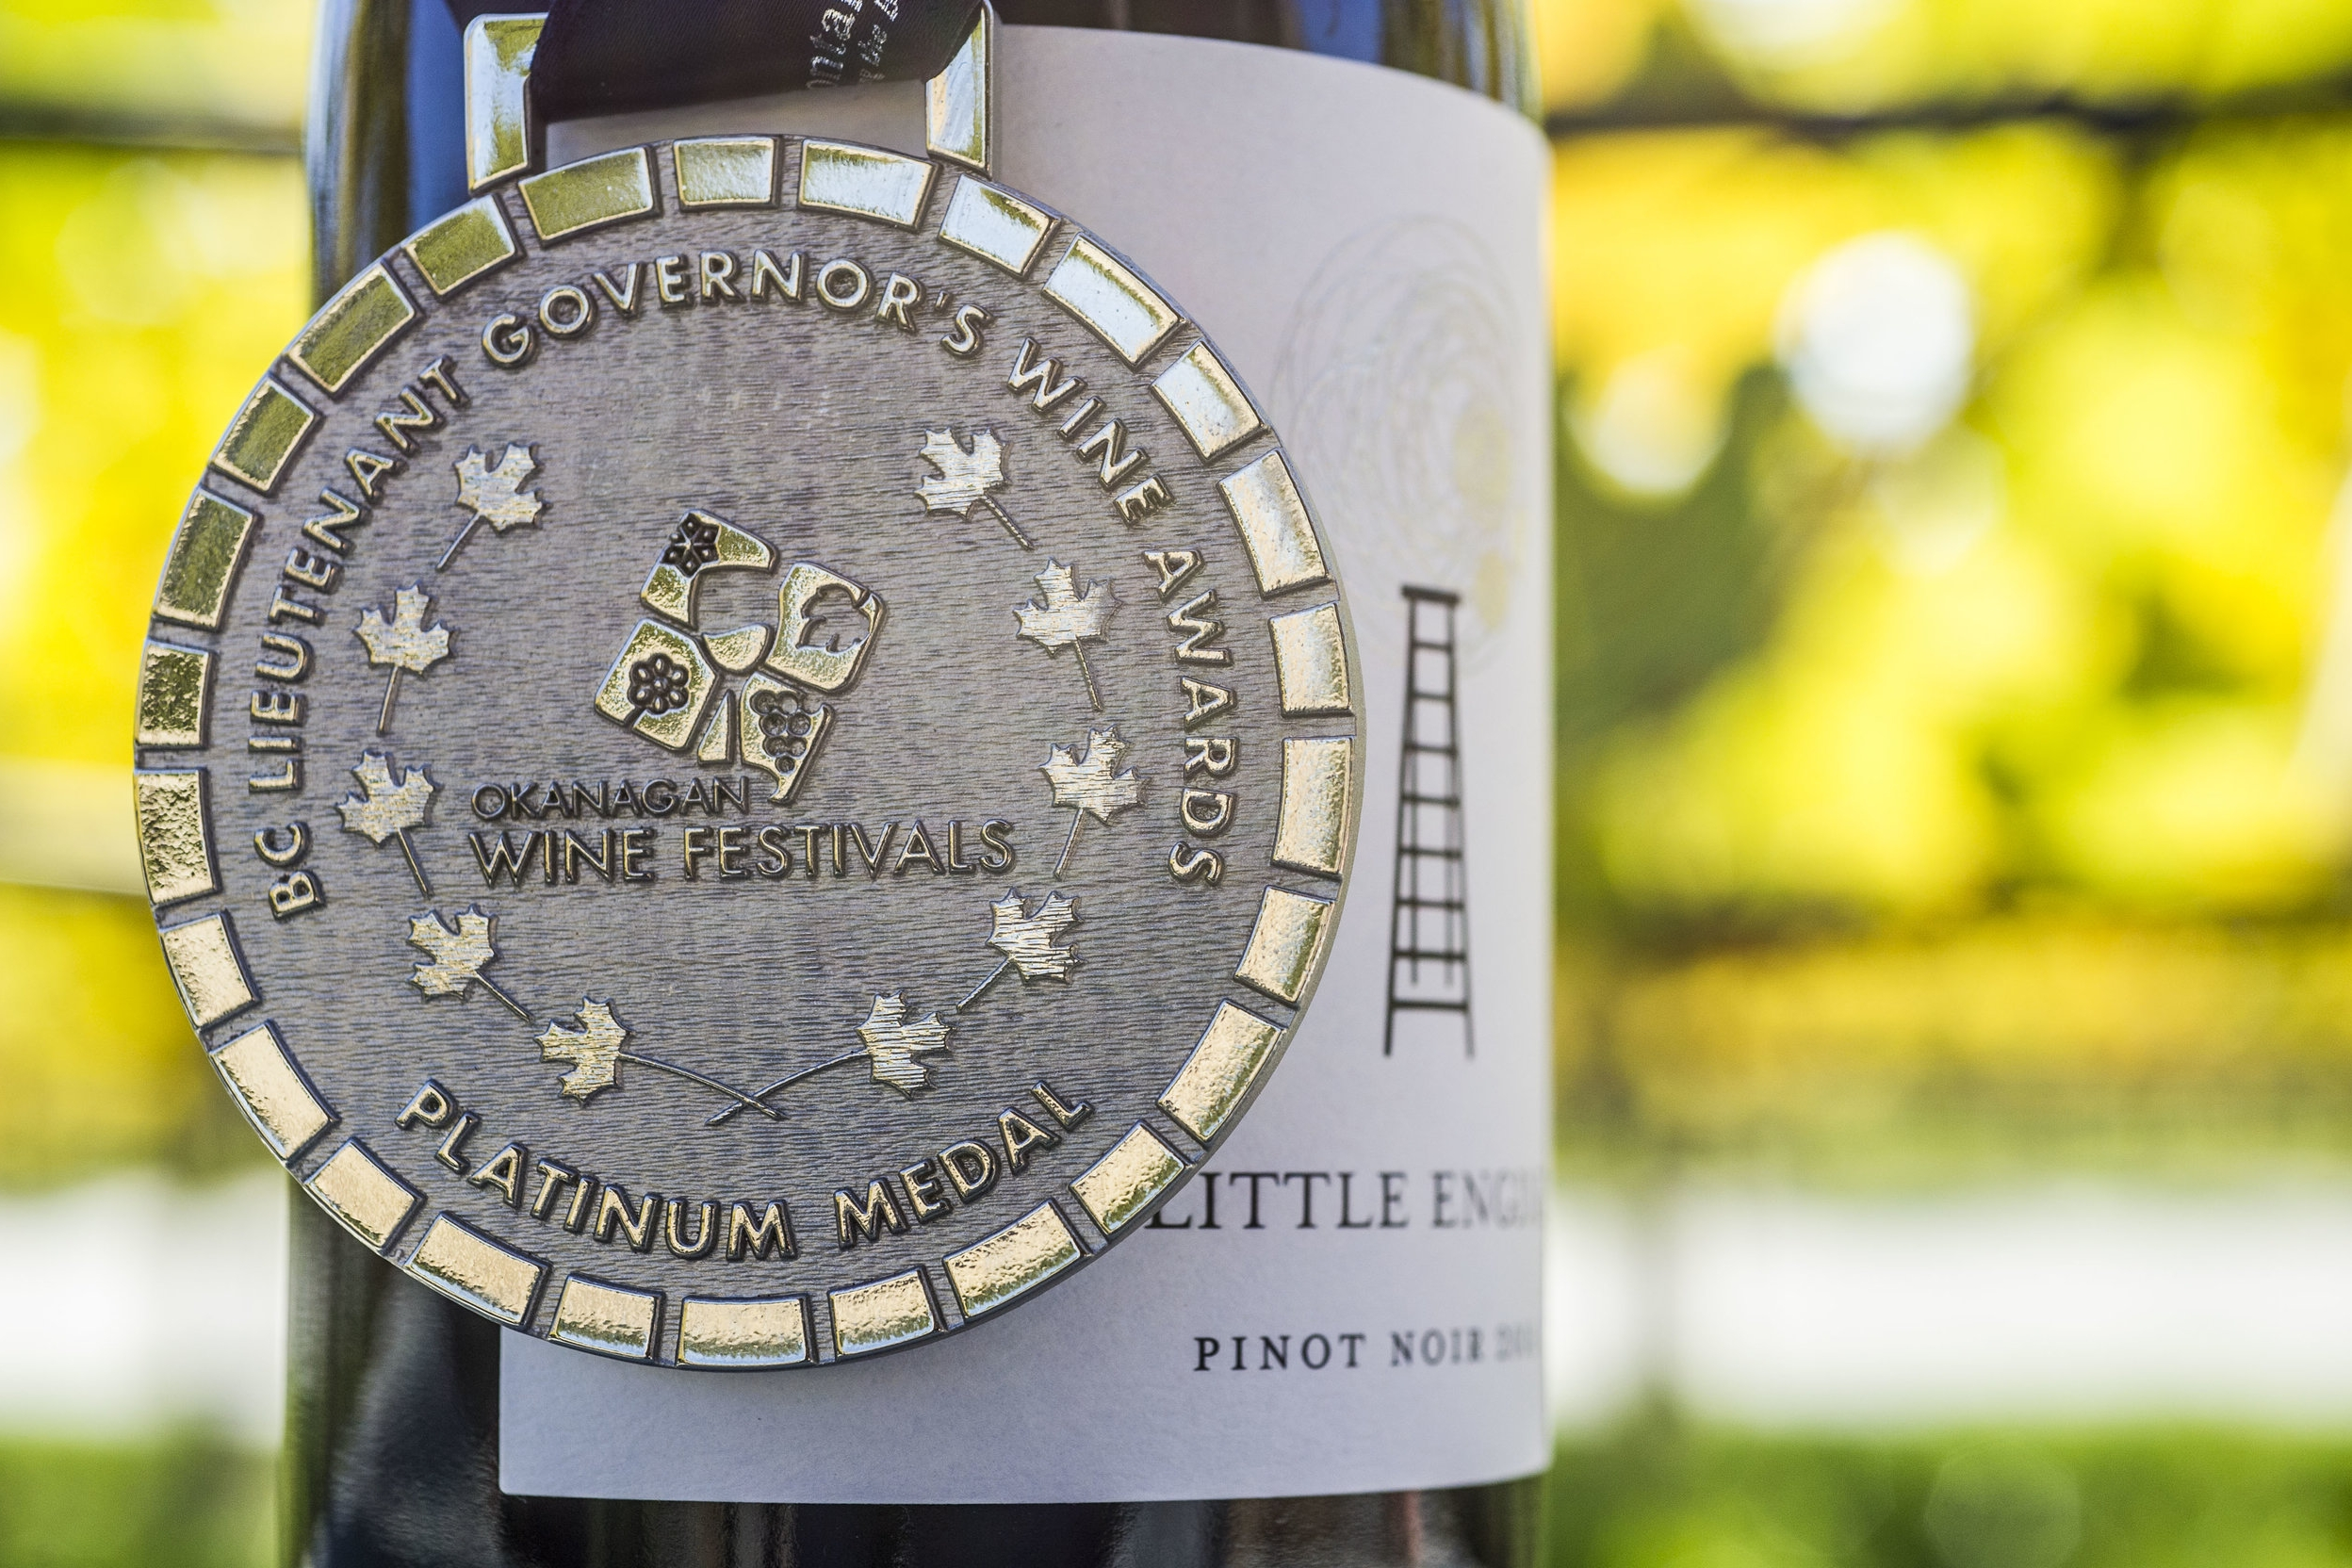 September 2018 - Platinum Medal received for Pinot - 2016 Silver Pinot Noir is awarded a Platinum Medal at the recent B.C. Lieutenant Governor Awards.